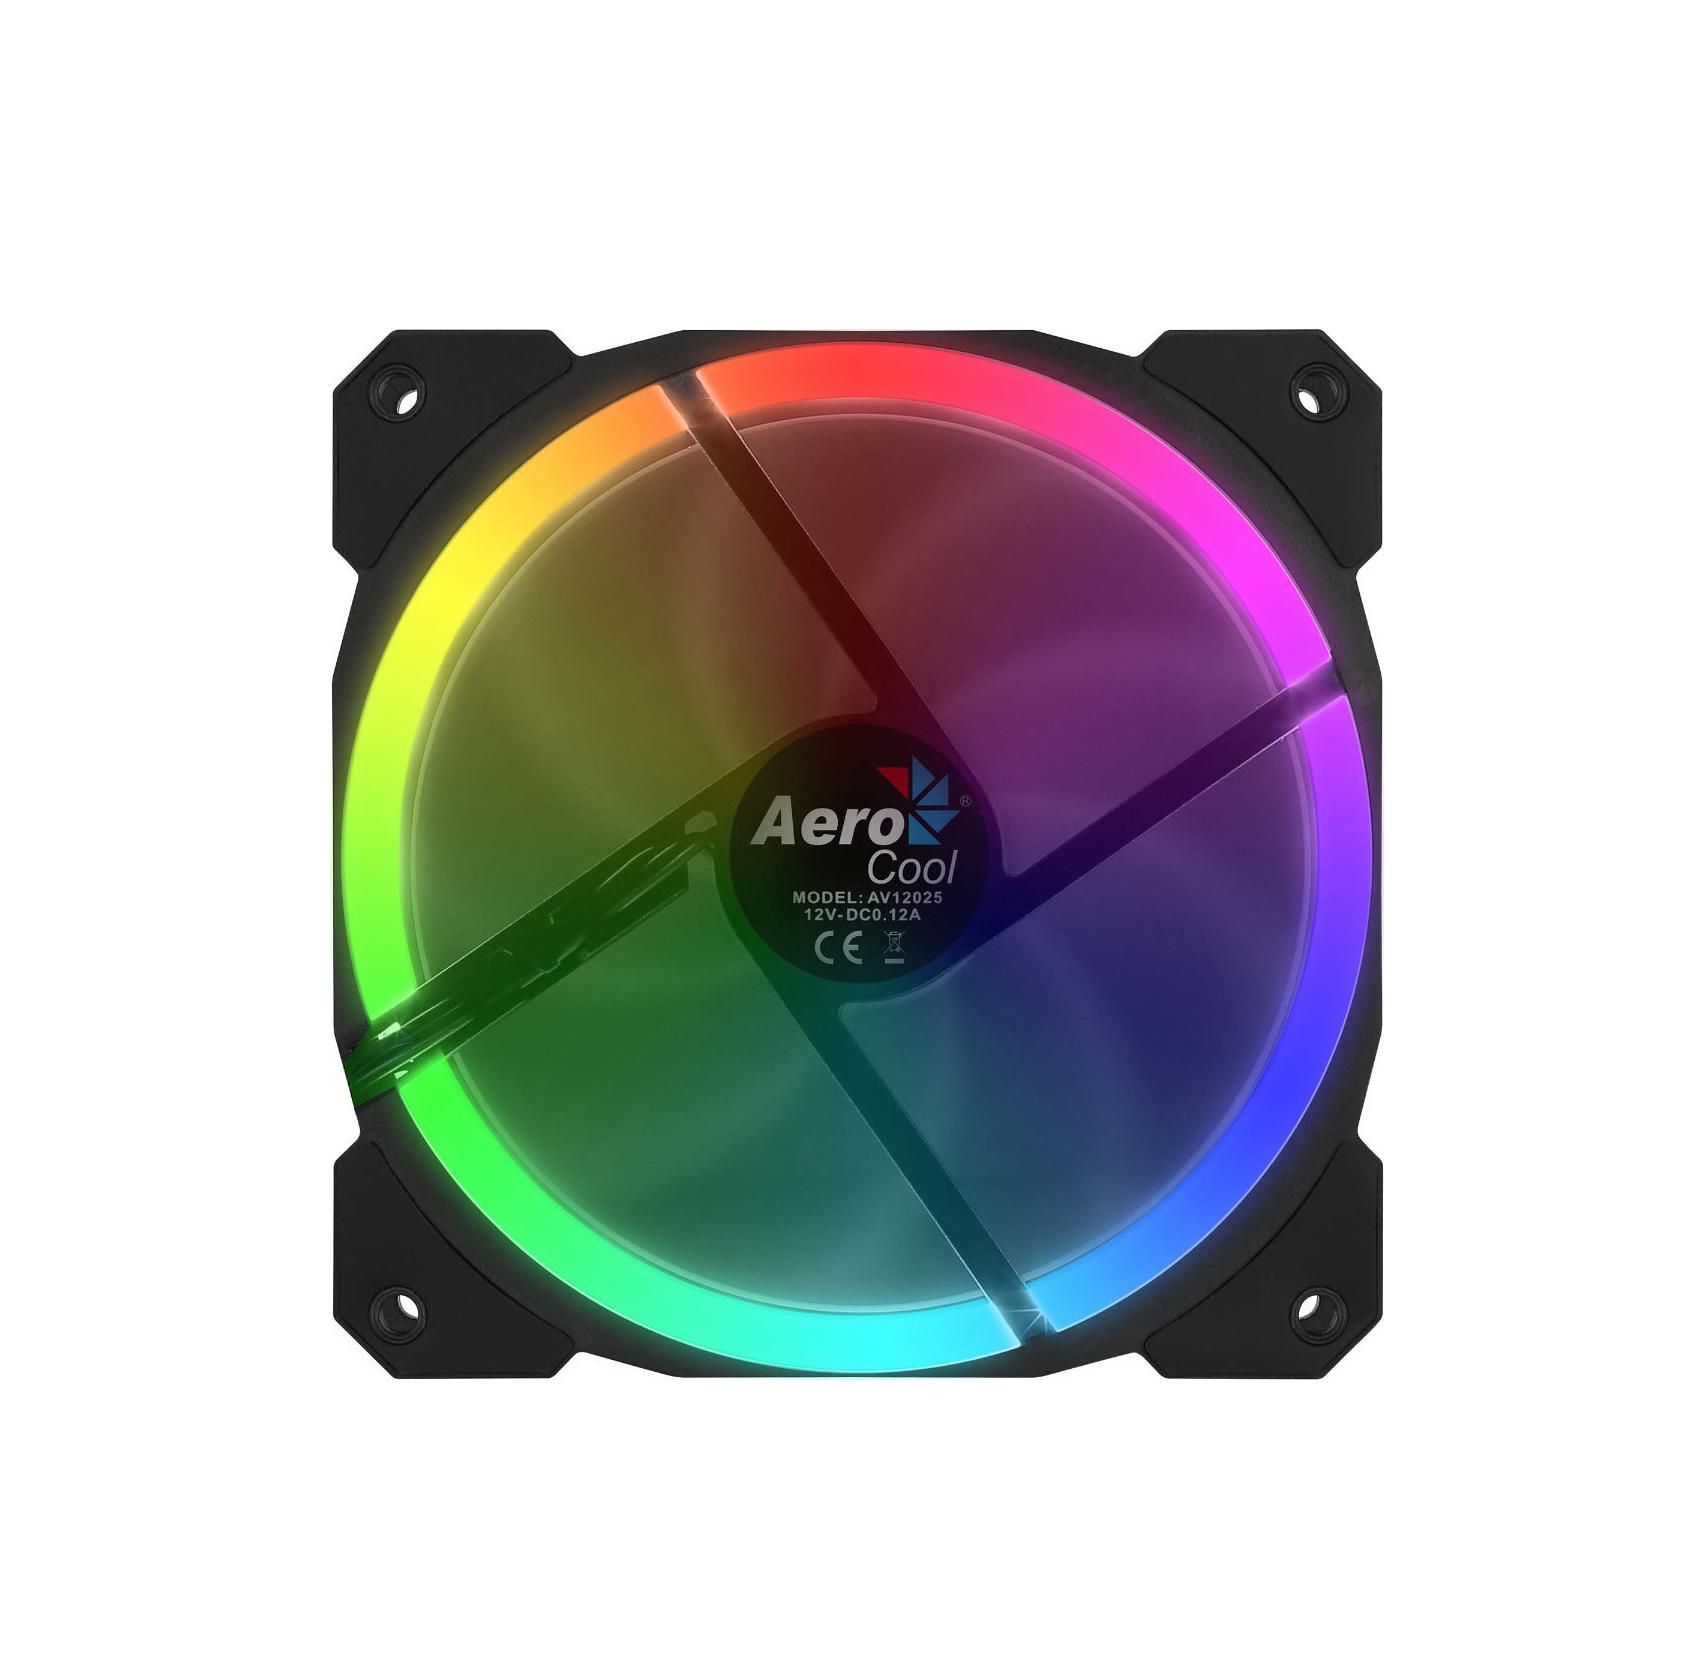 Aerocool Orbit 120mm ACF3-OB10217.01